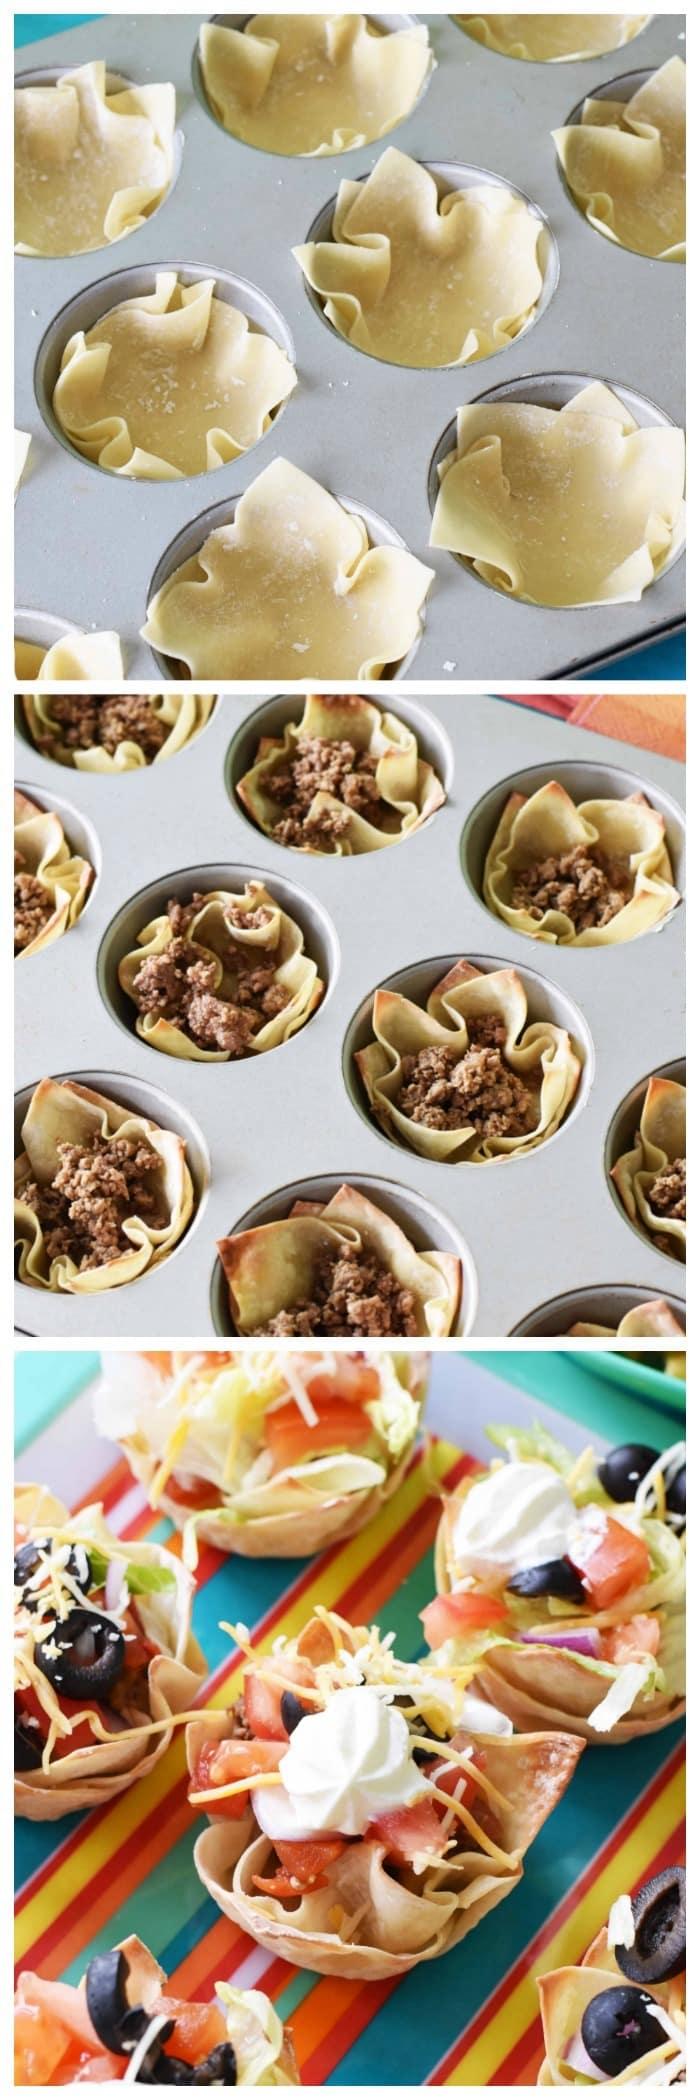 Wonton Taco Cups made in a muffin tin